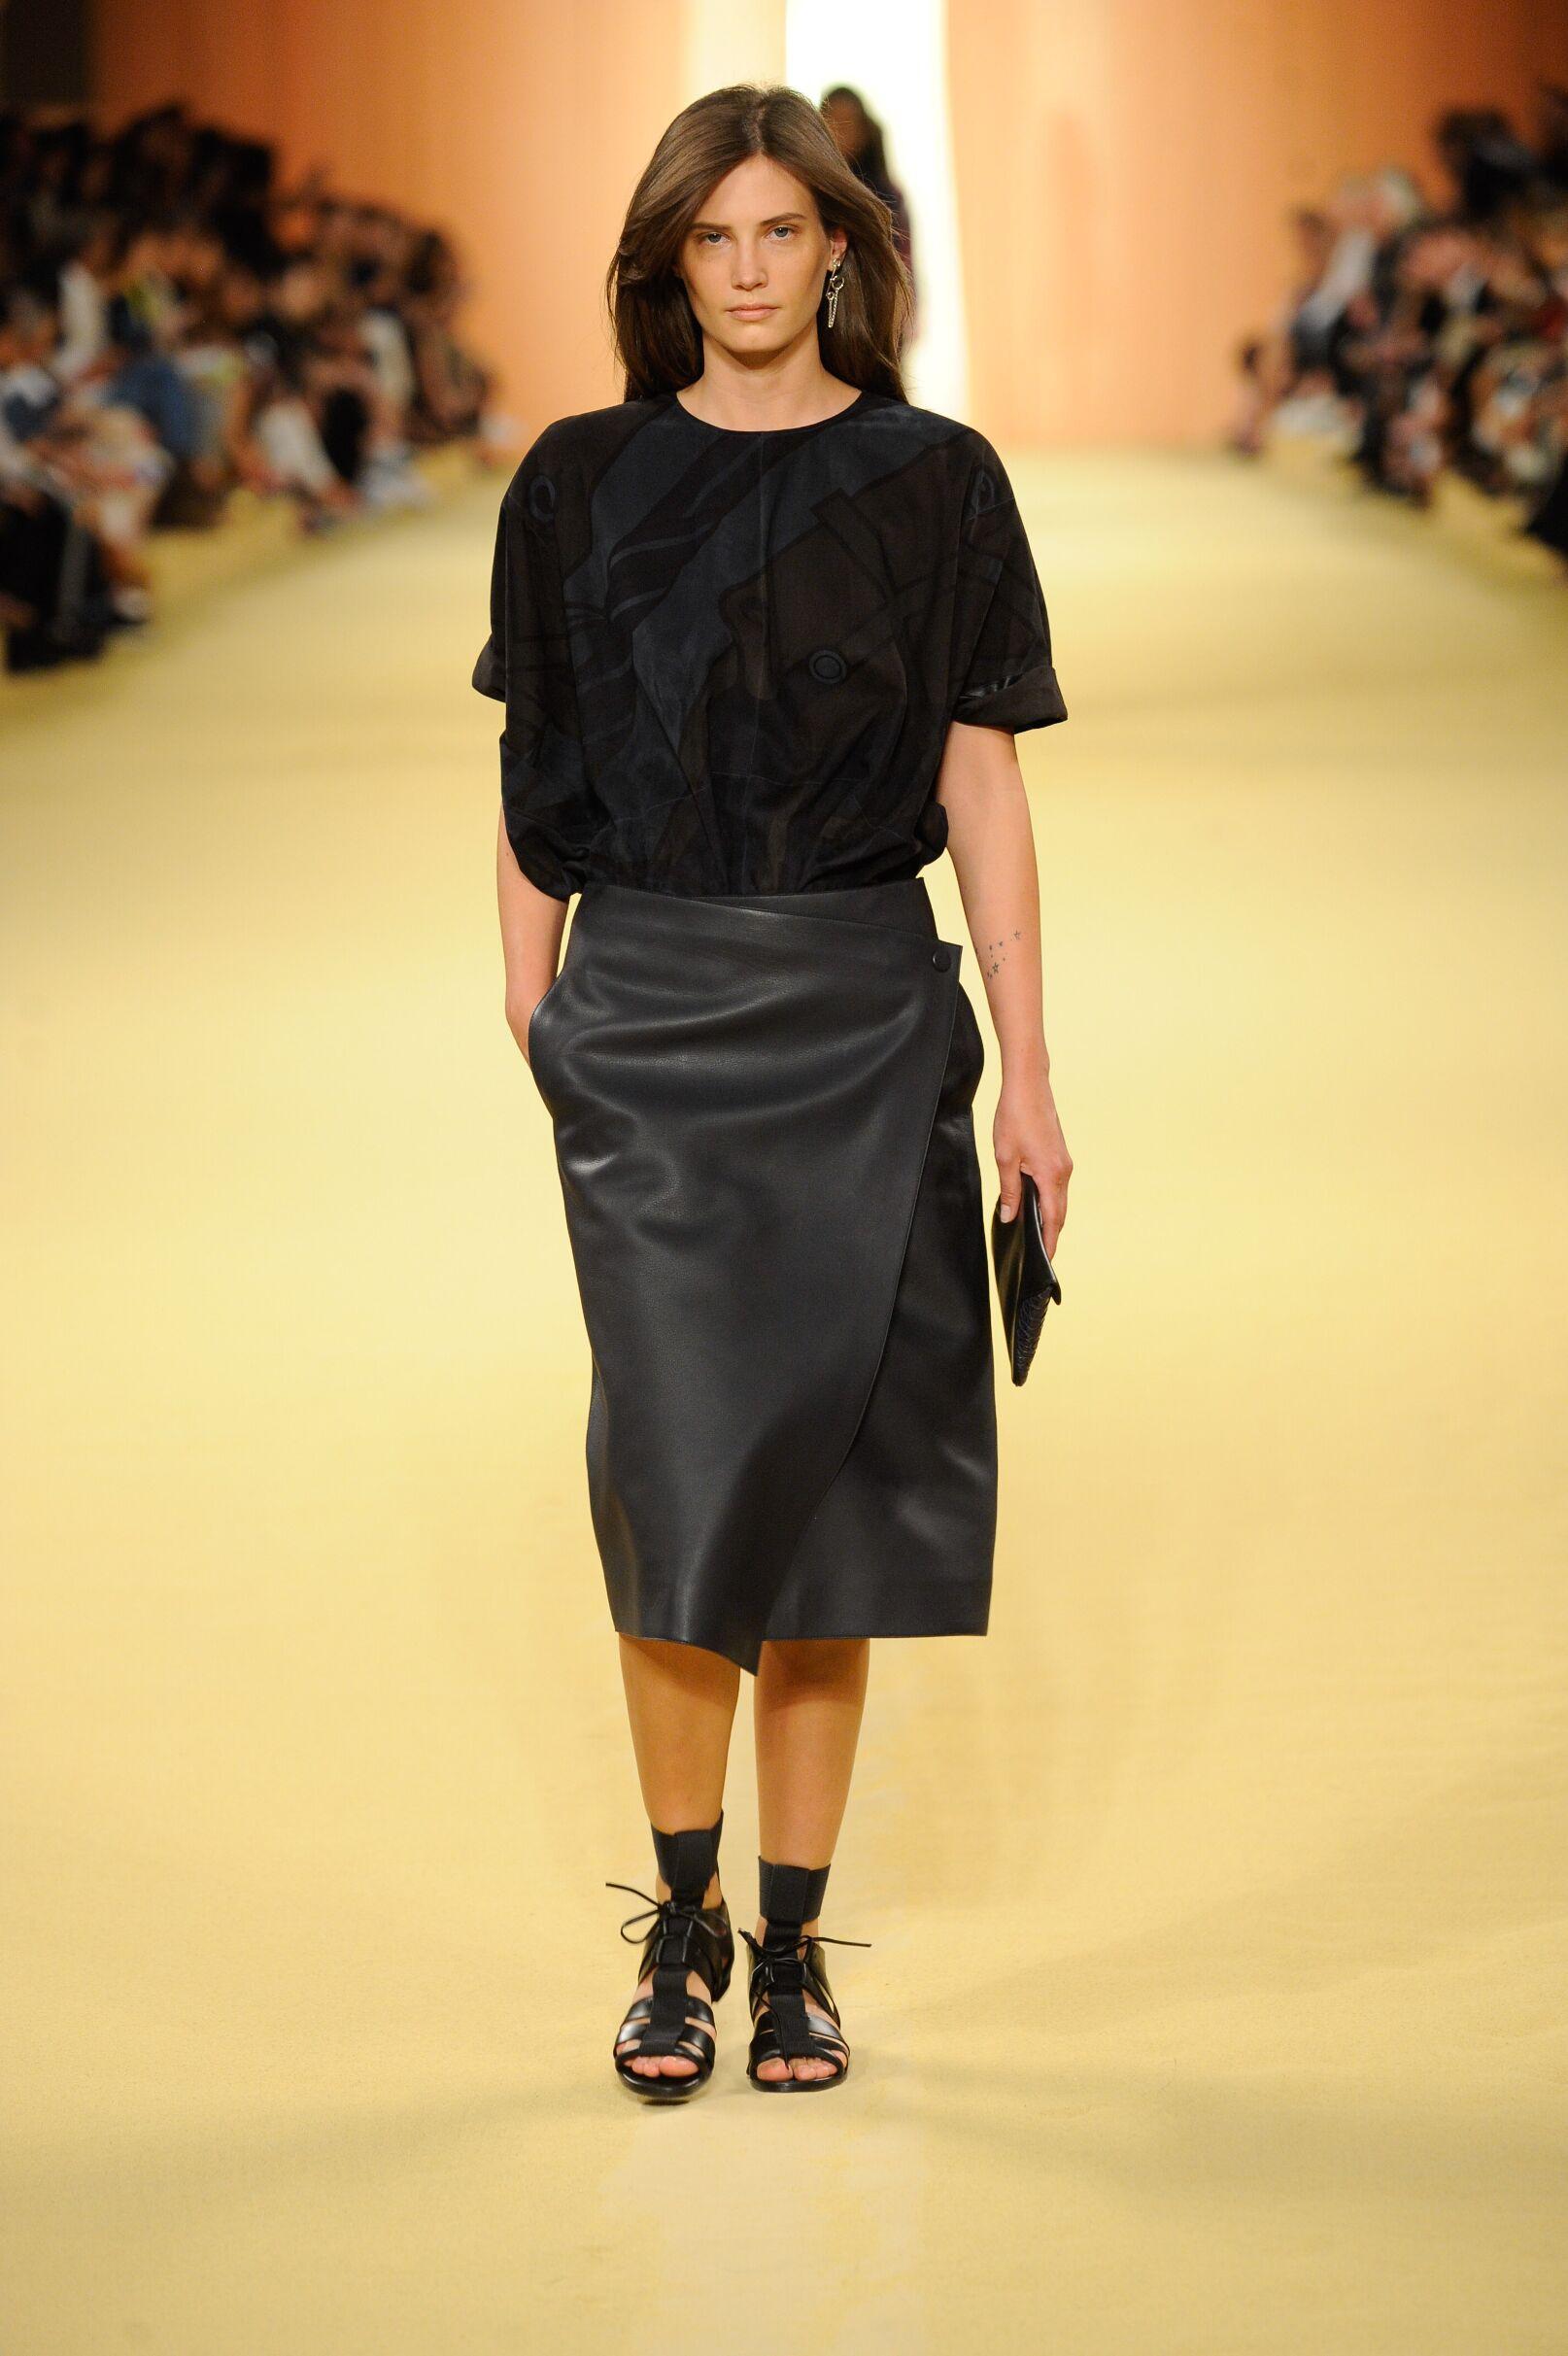 Hermès SS 2015 Catwalk